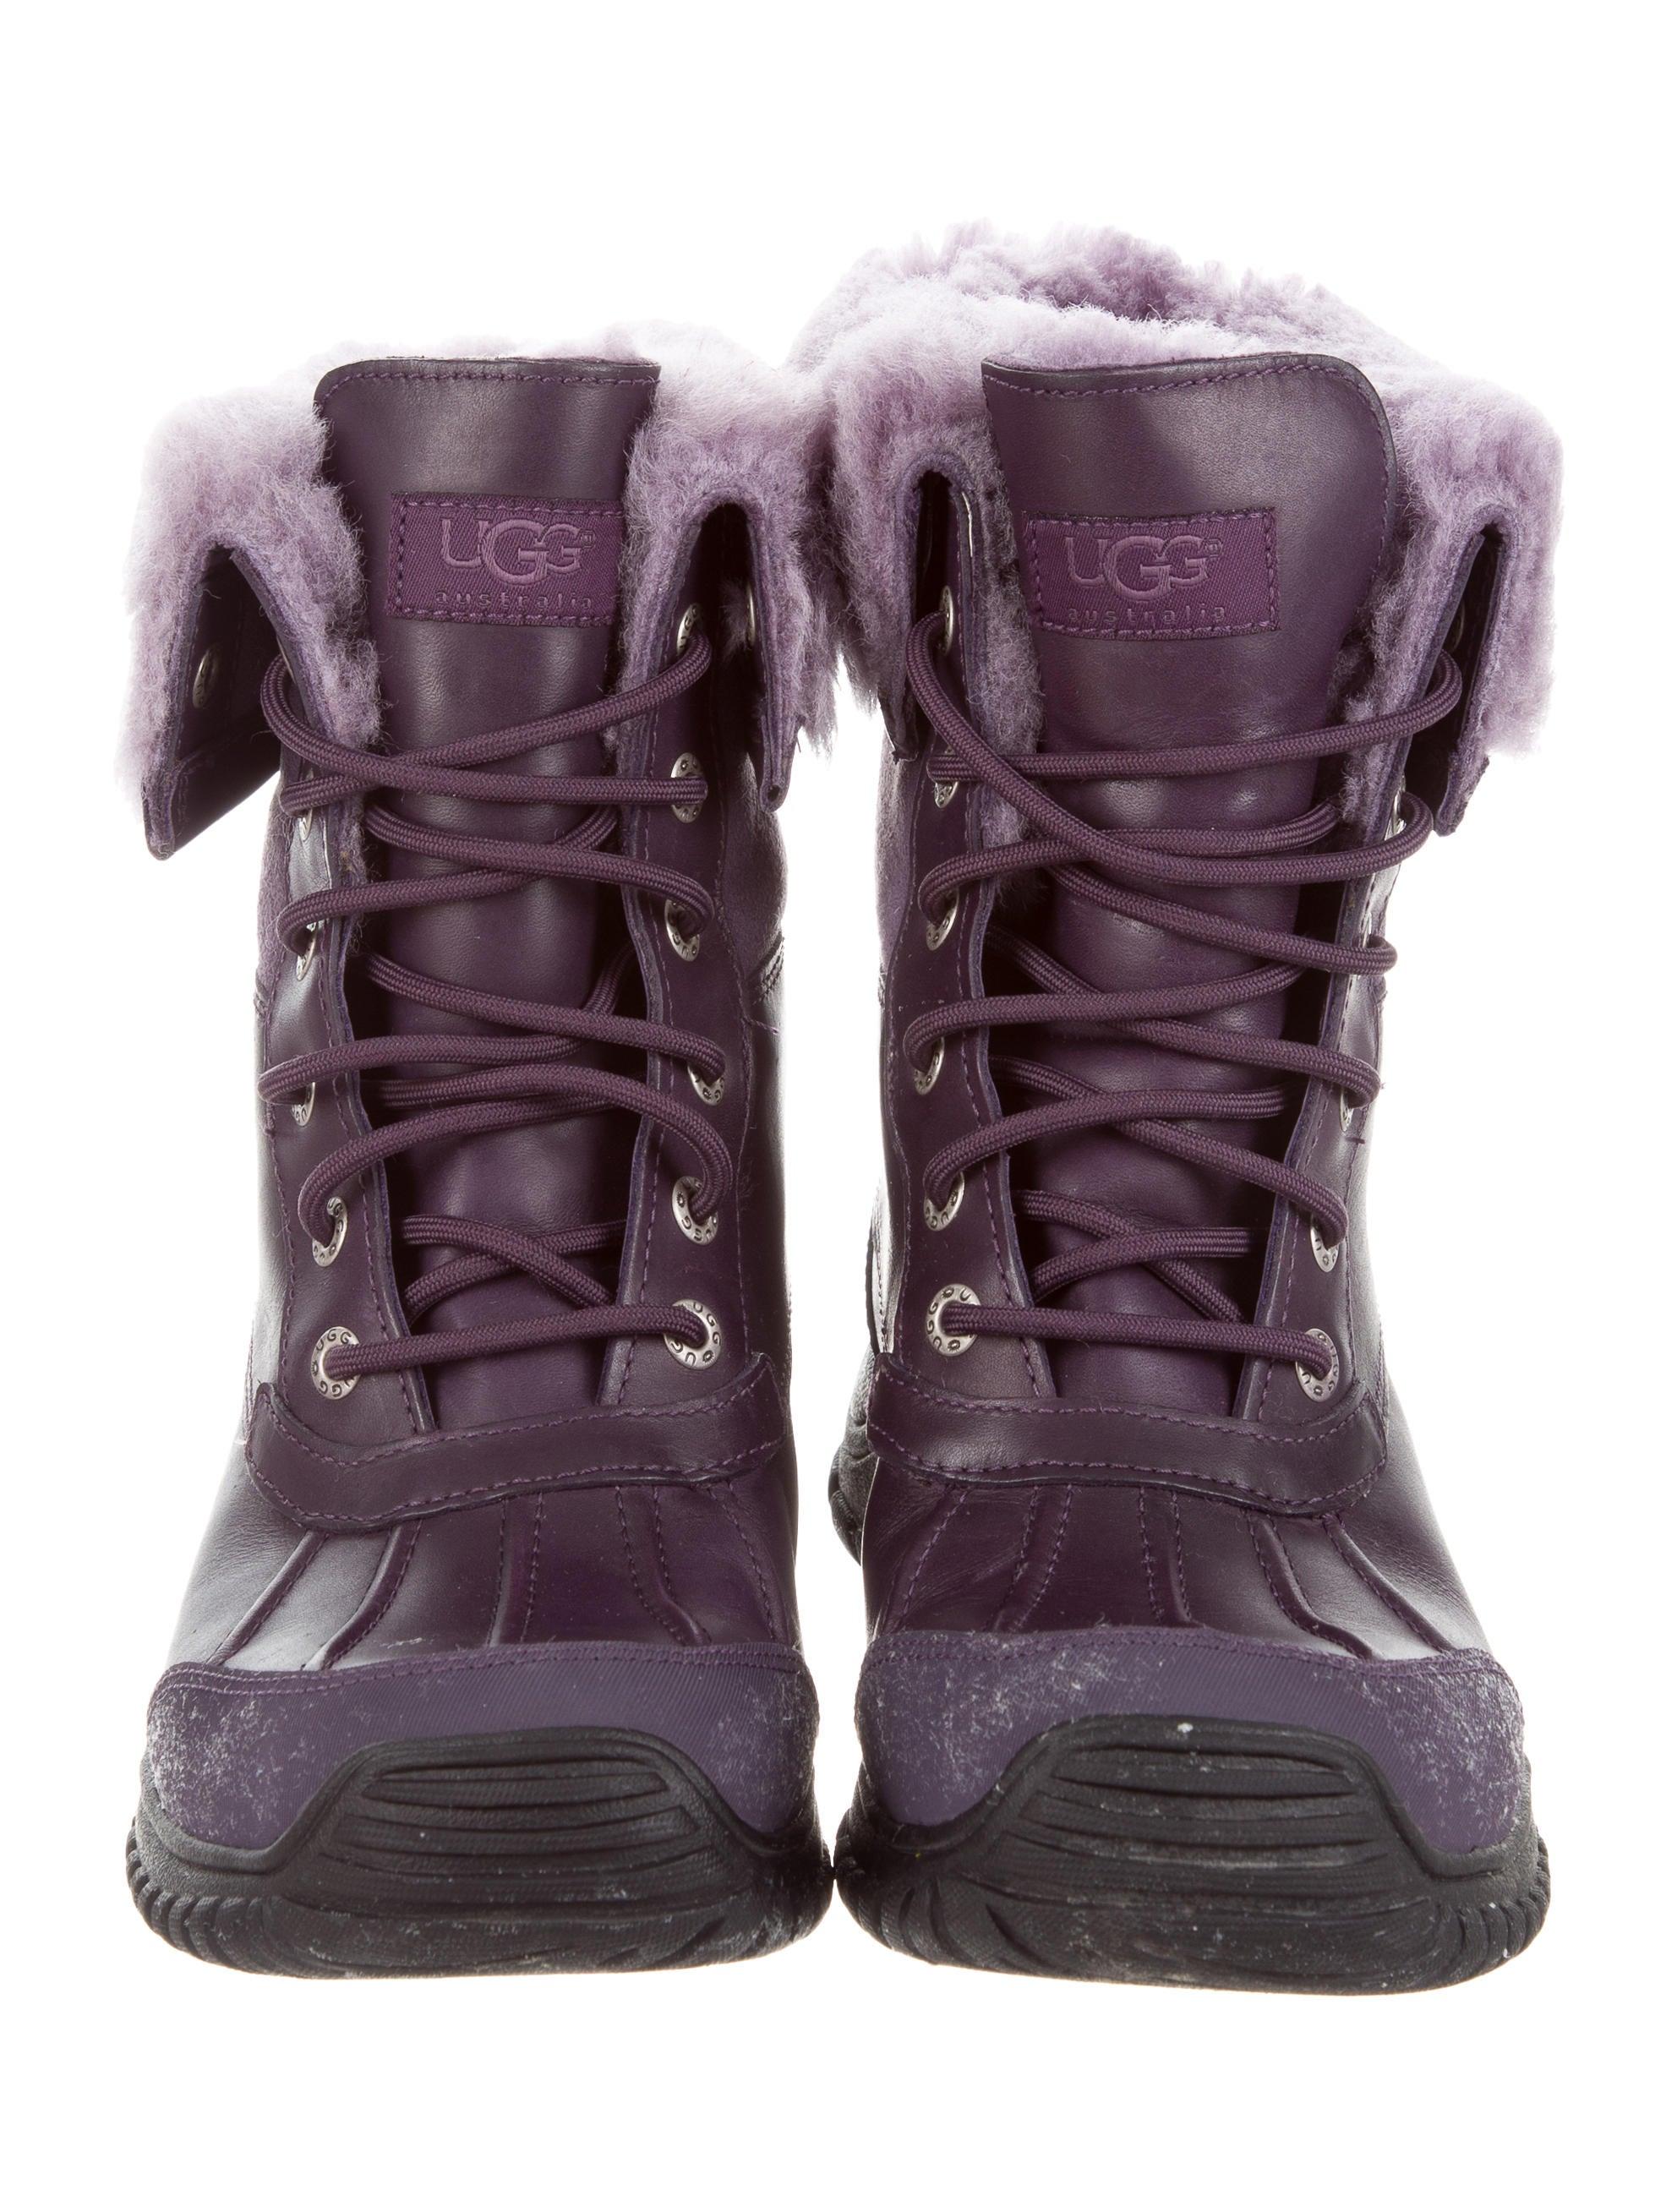 Adirondack Snow Boots